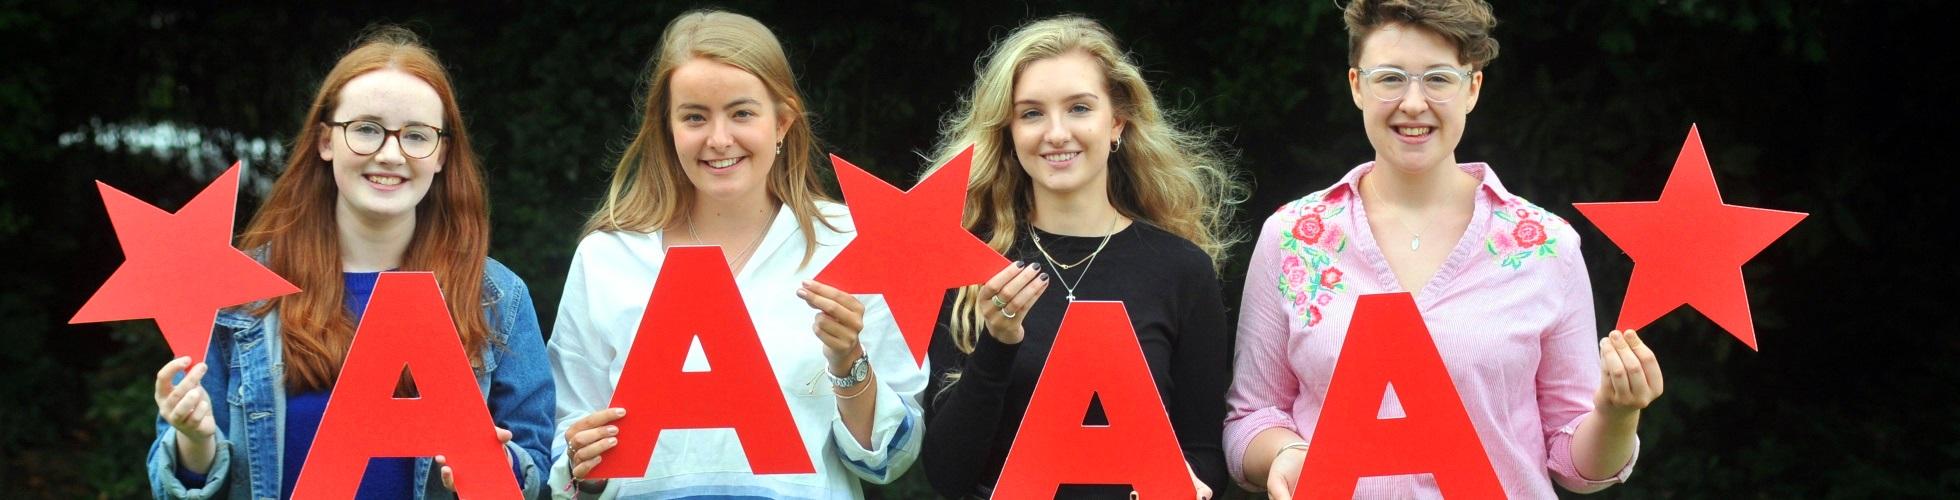 Harrogate Ladies College Exam Results – main image